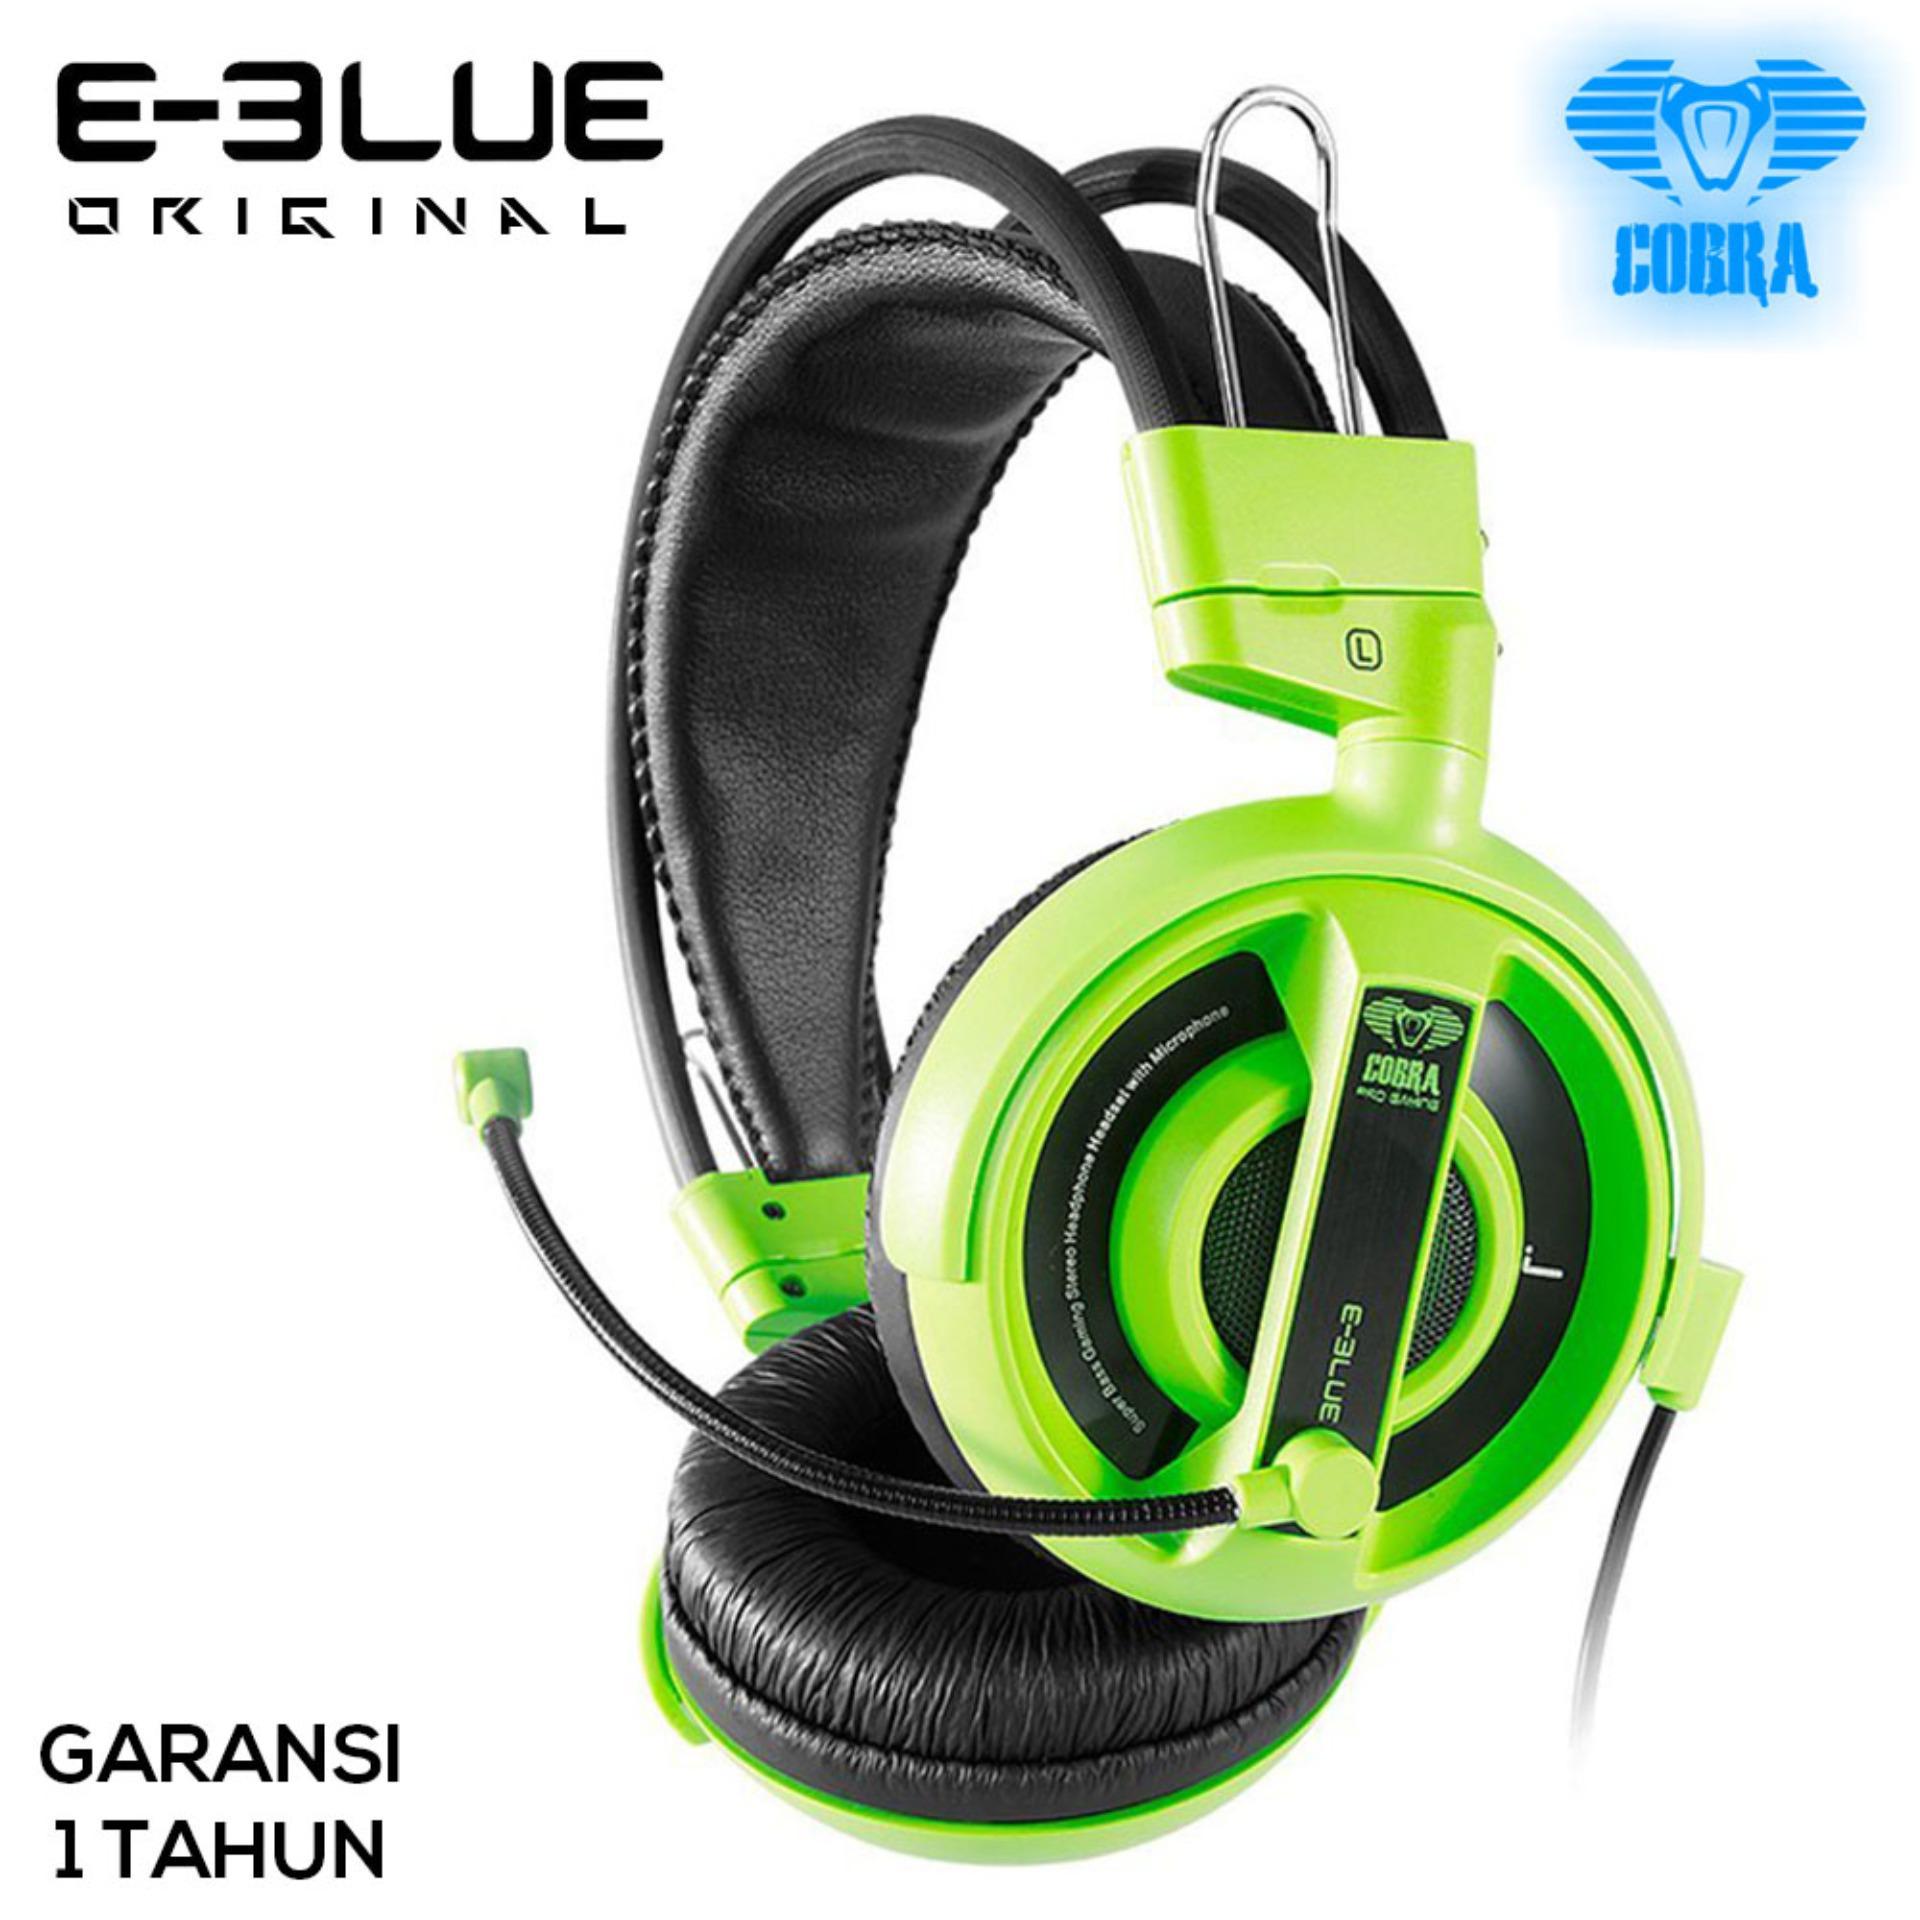 E-Blue Cobra Series Professional Gaming Headset  - EHS013 - Green